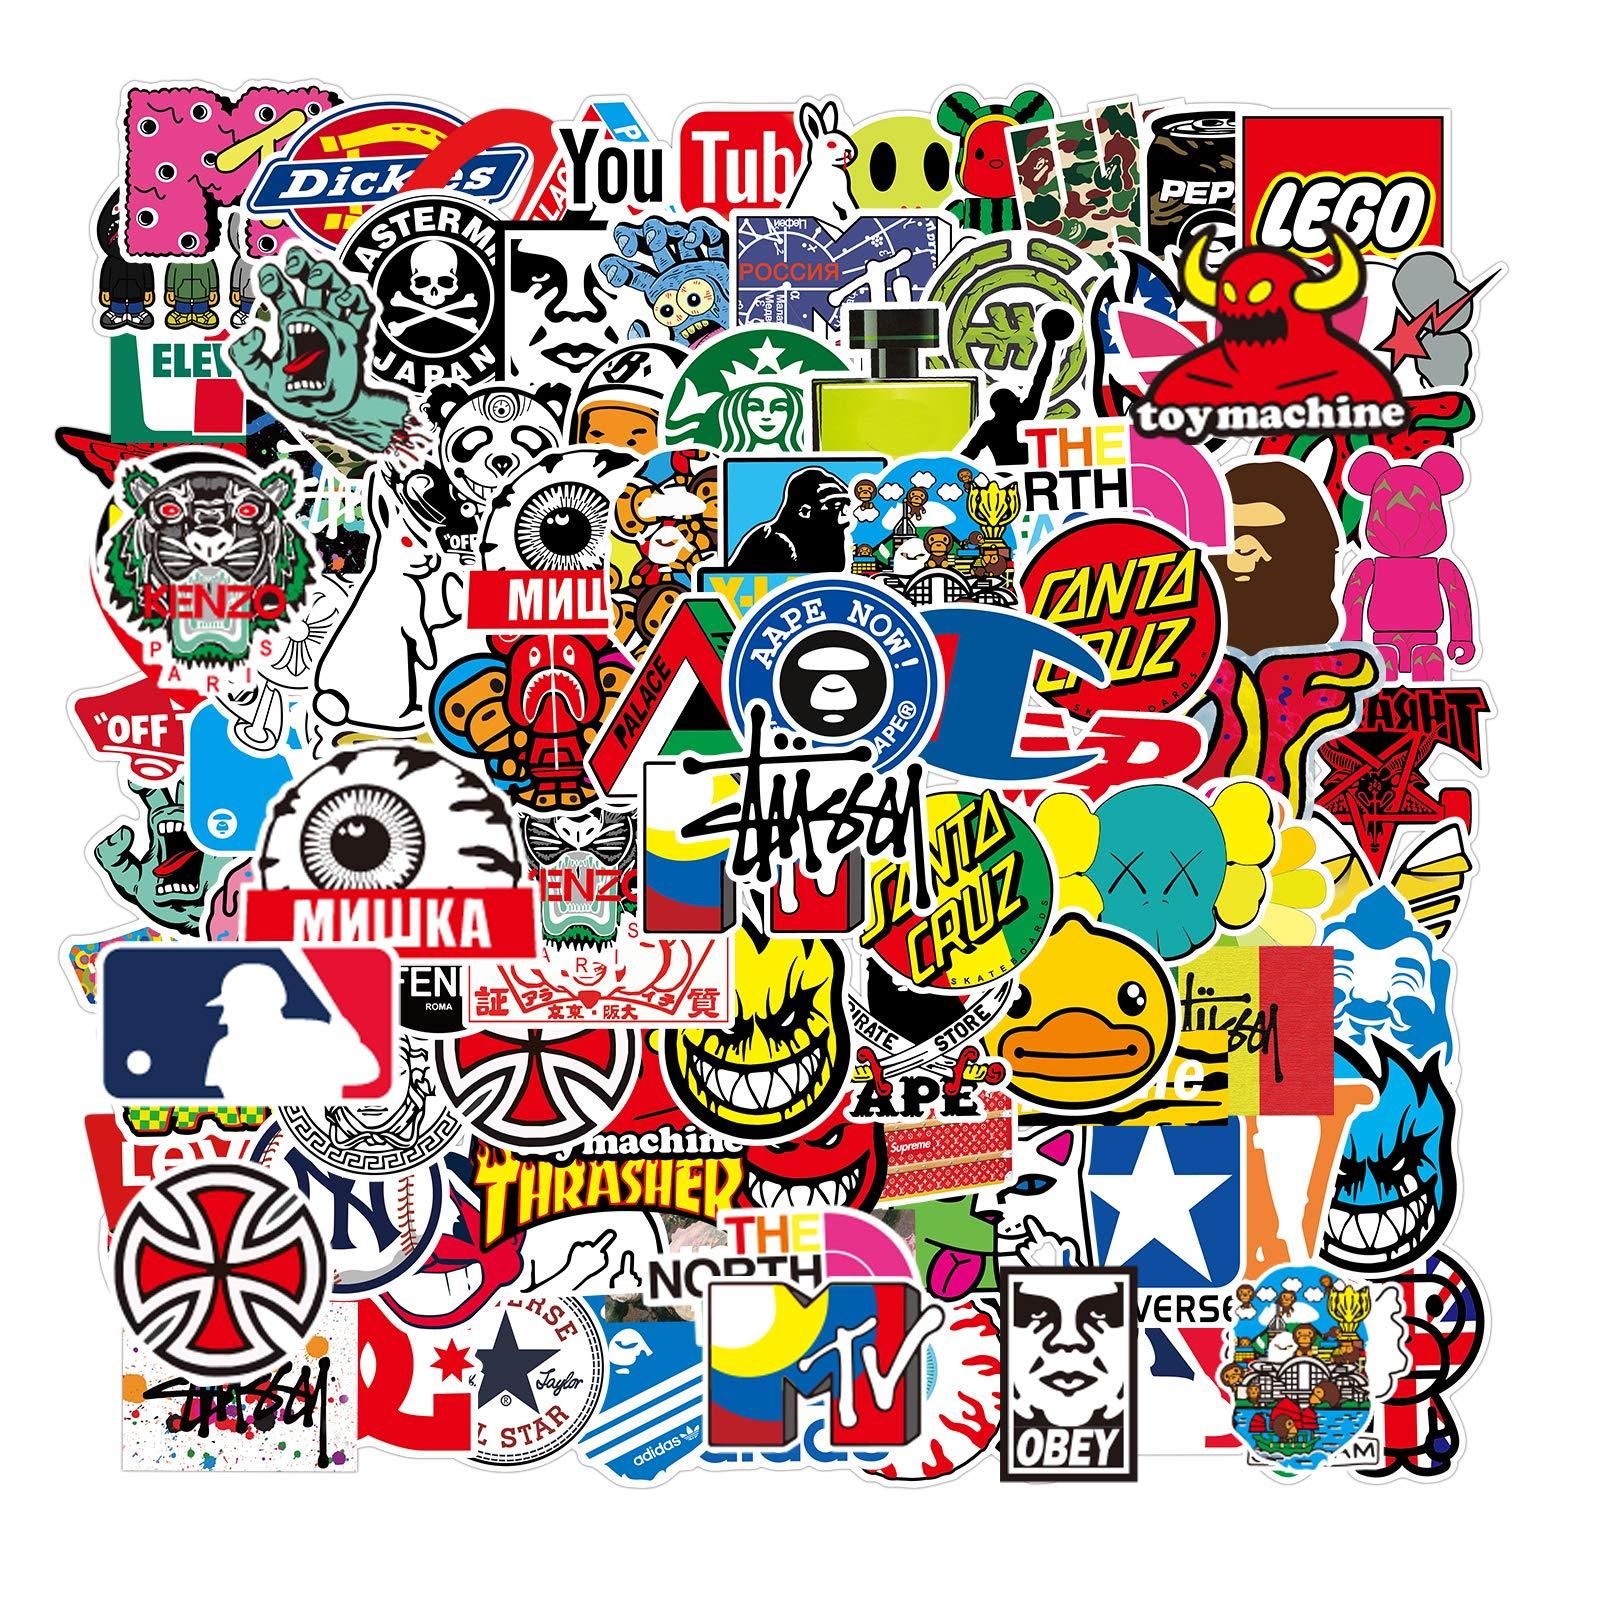 Nertpow Cool Brand Stickers 101 Pack Decals for Laptop Computer Skateboard Water Bottles Car Teens Sticker